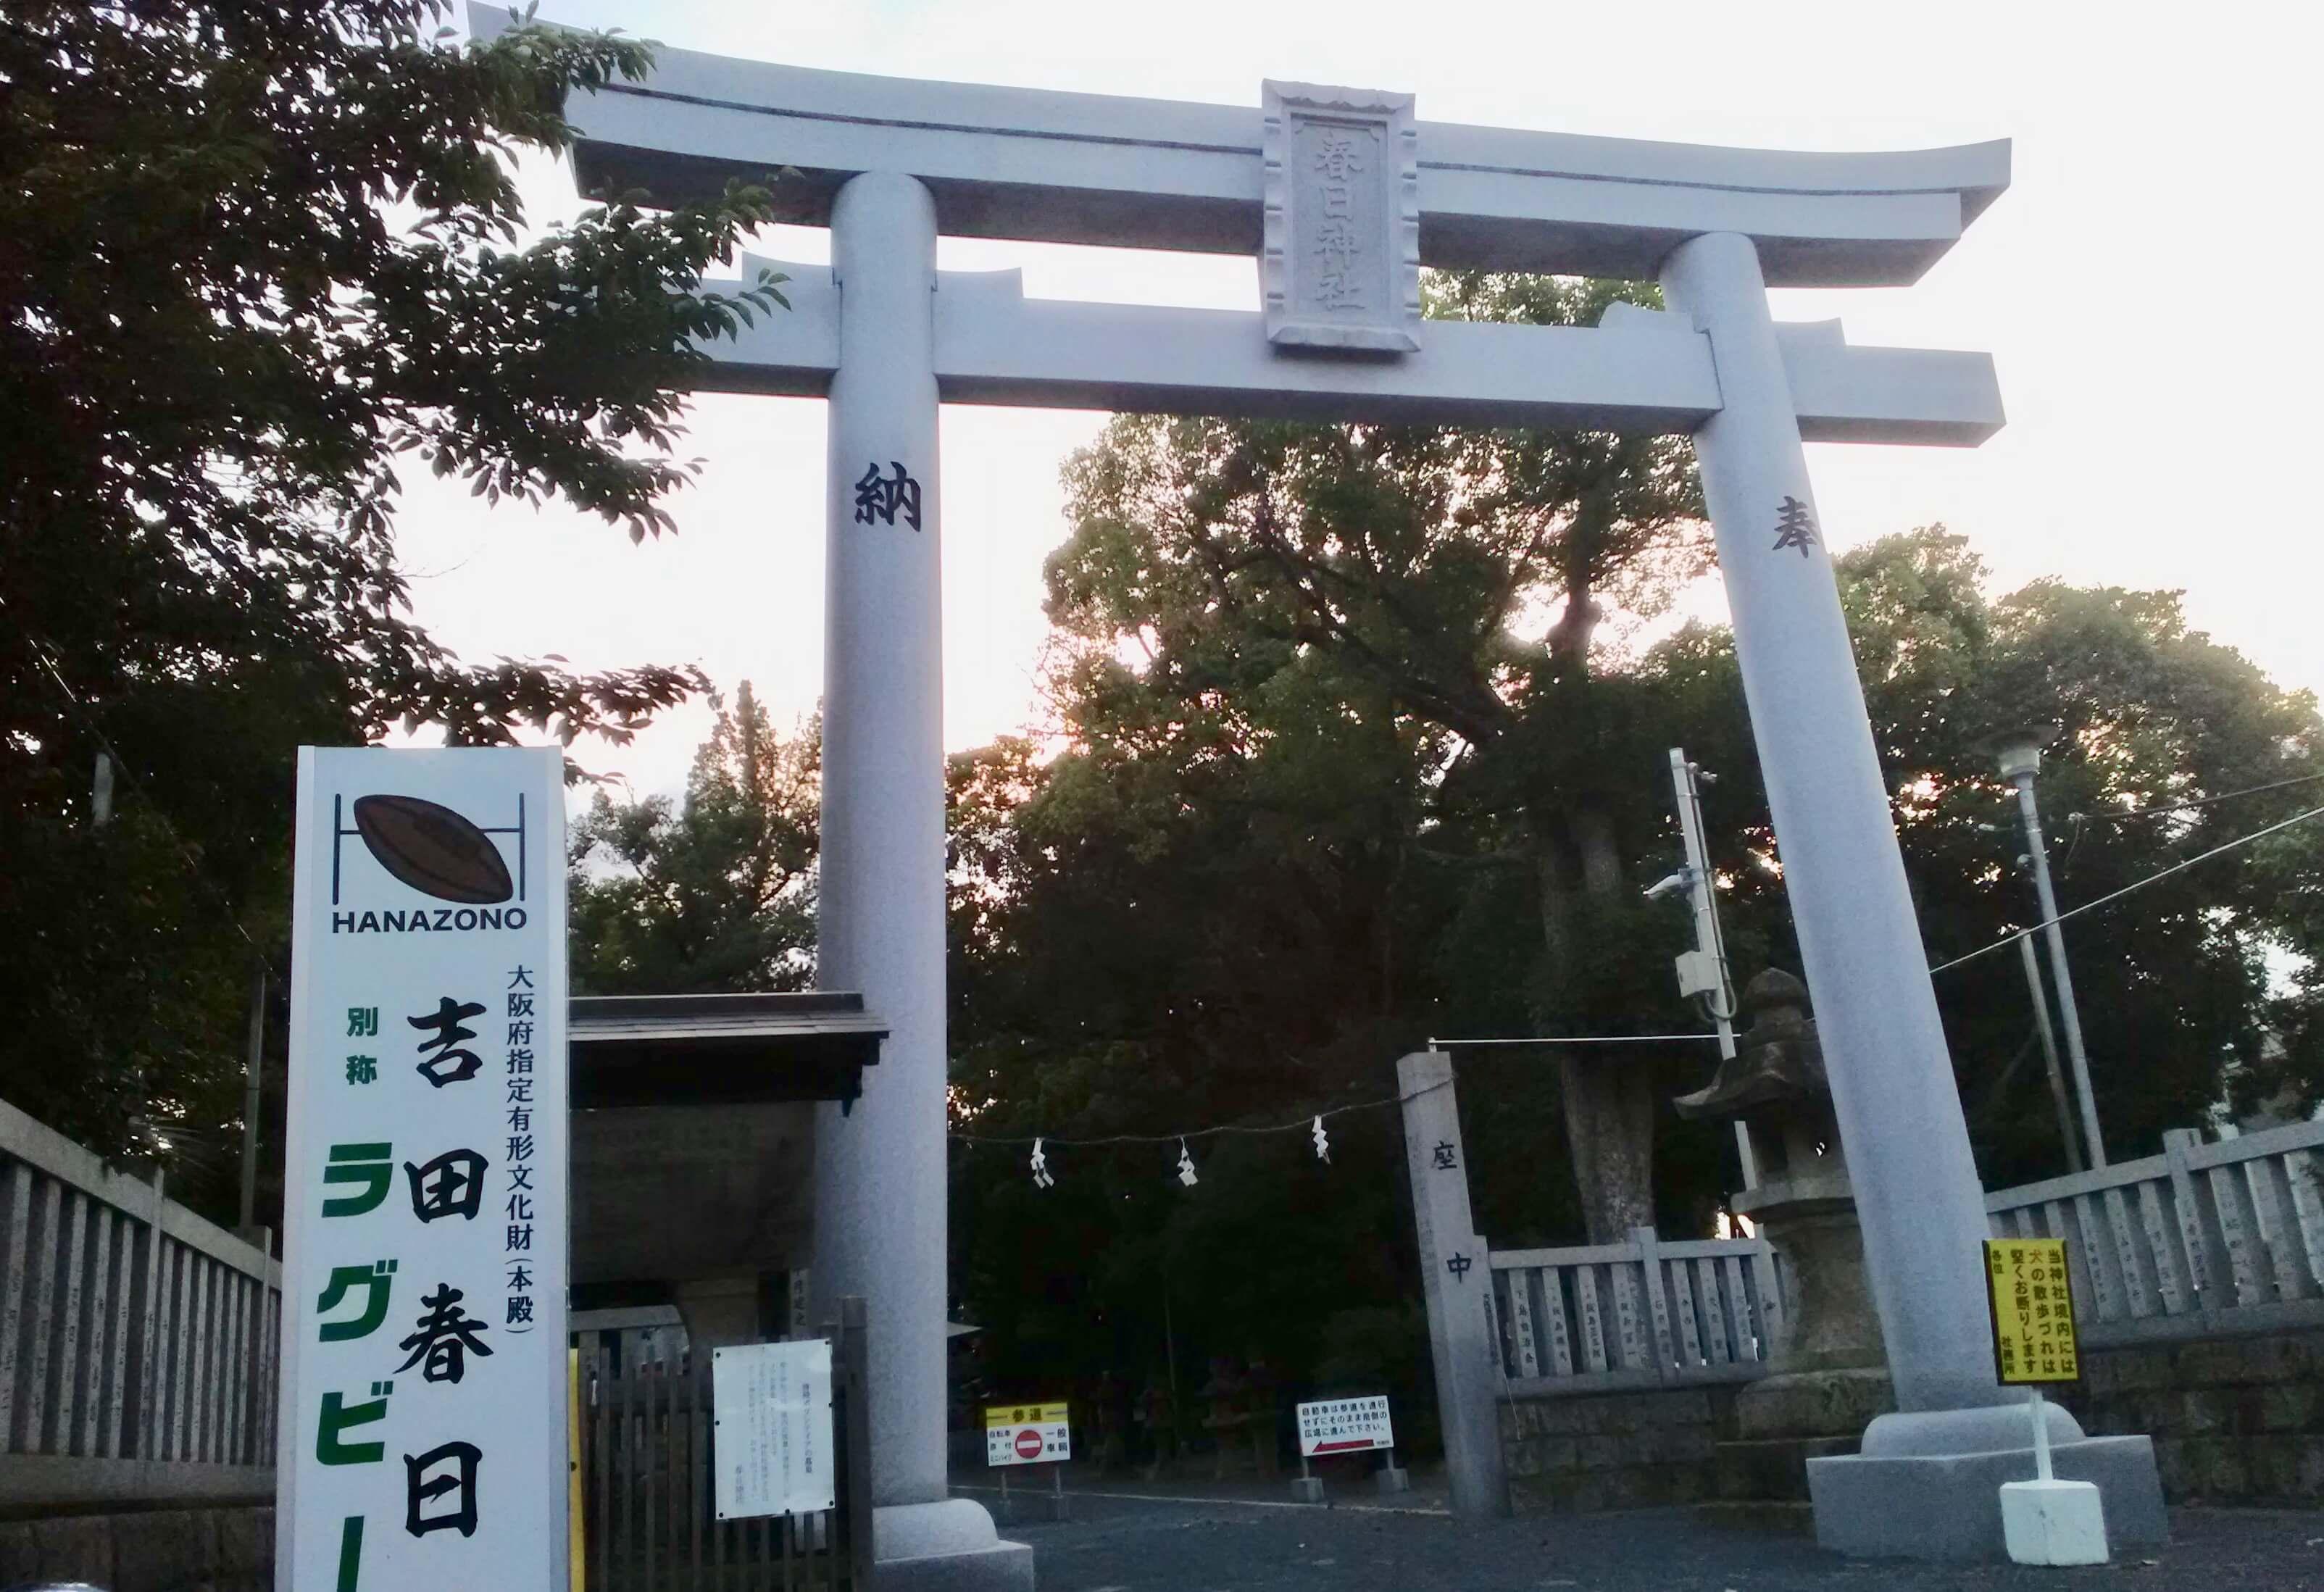 Kasuga rugby shrine, Hanazono, Higashi-Osaka